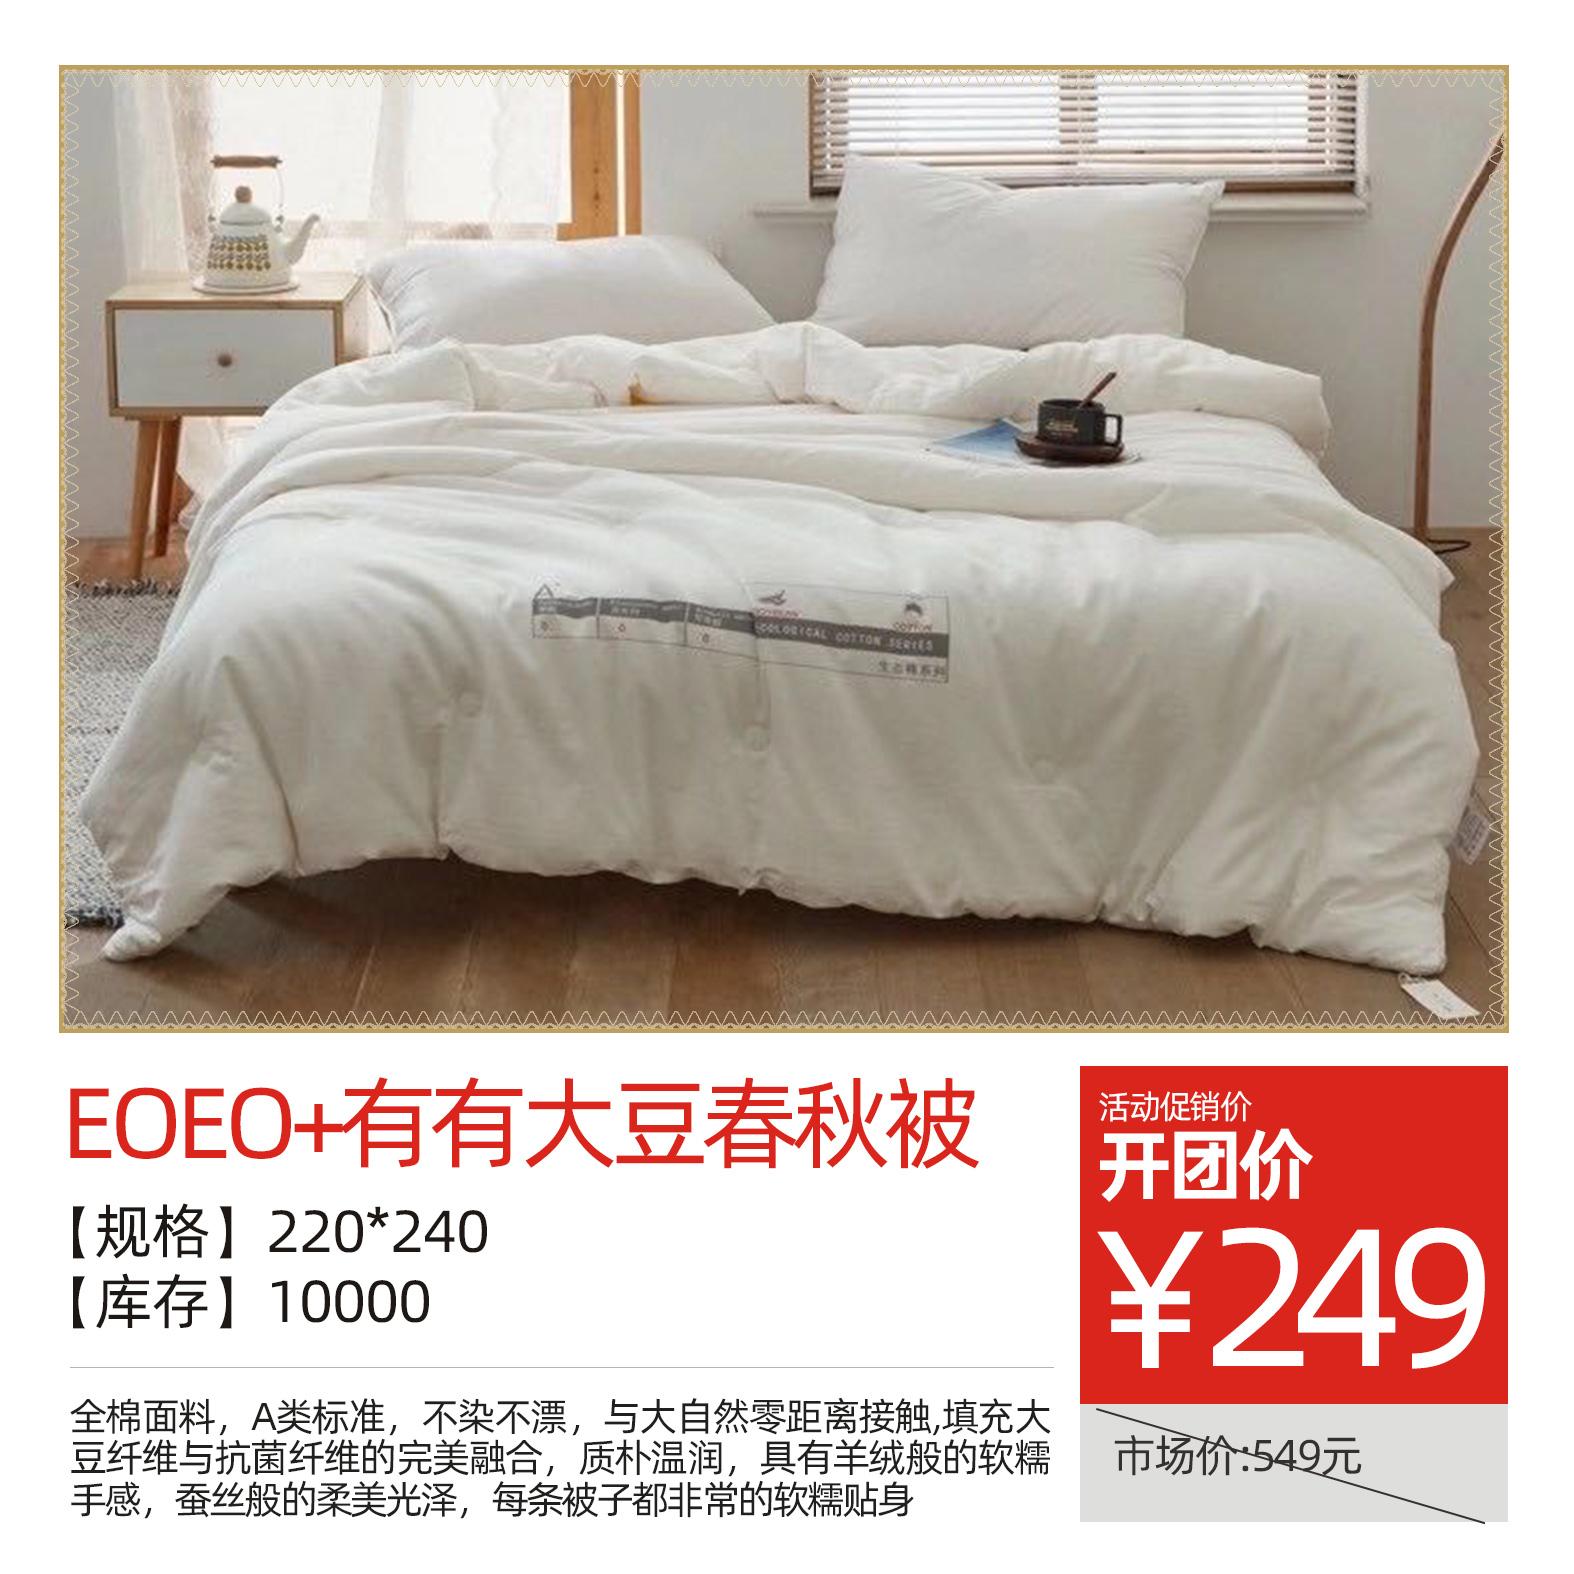 eoeo+有有大豆春秋被220*240